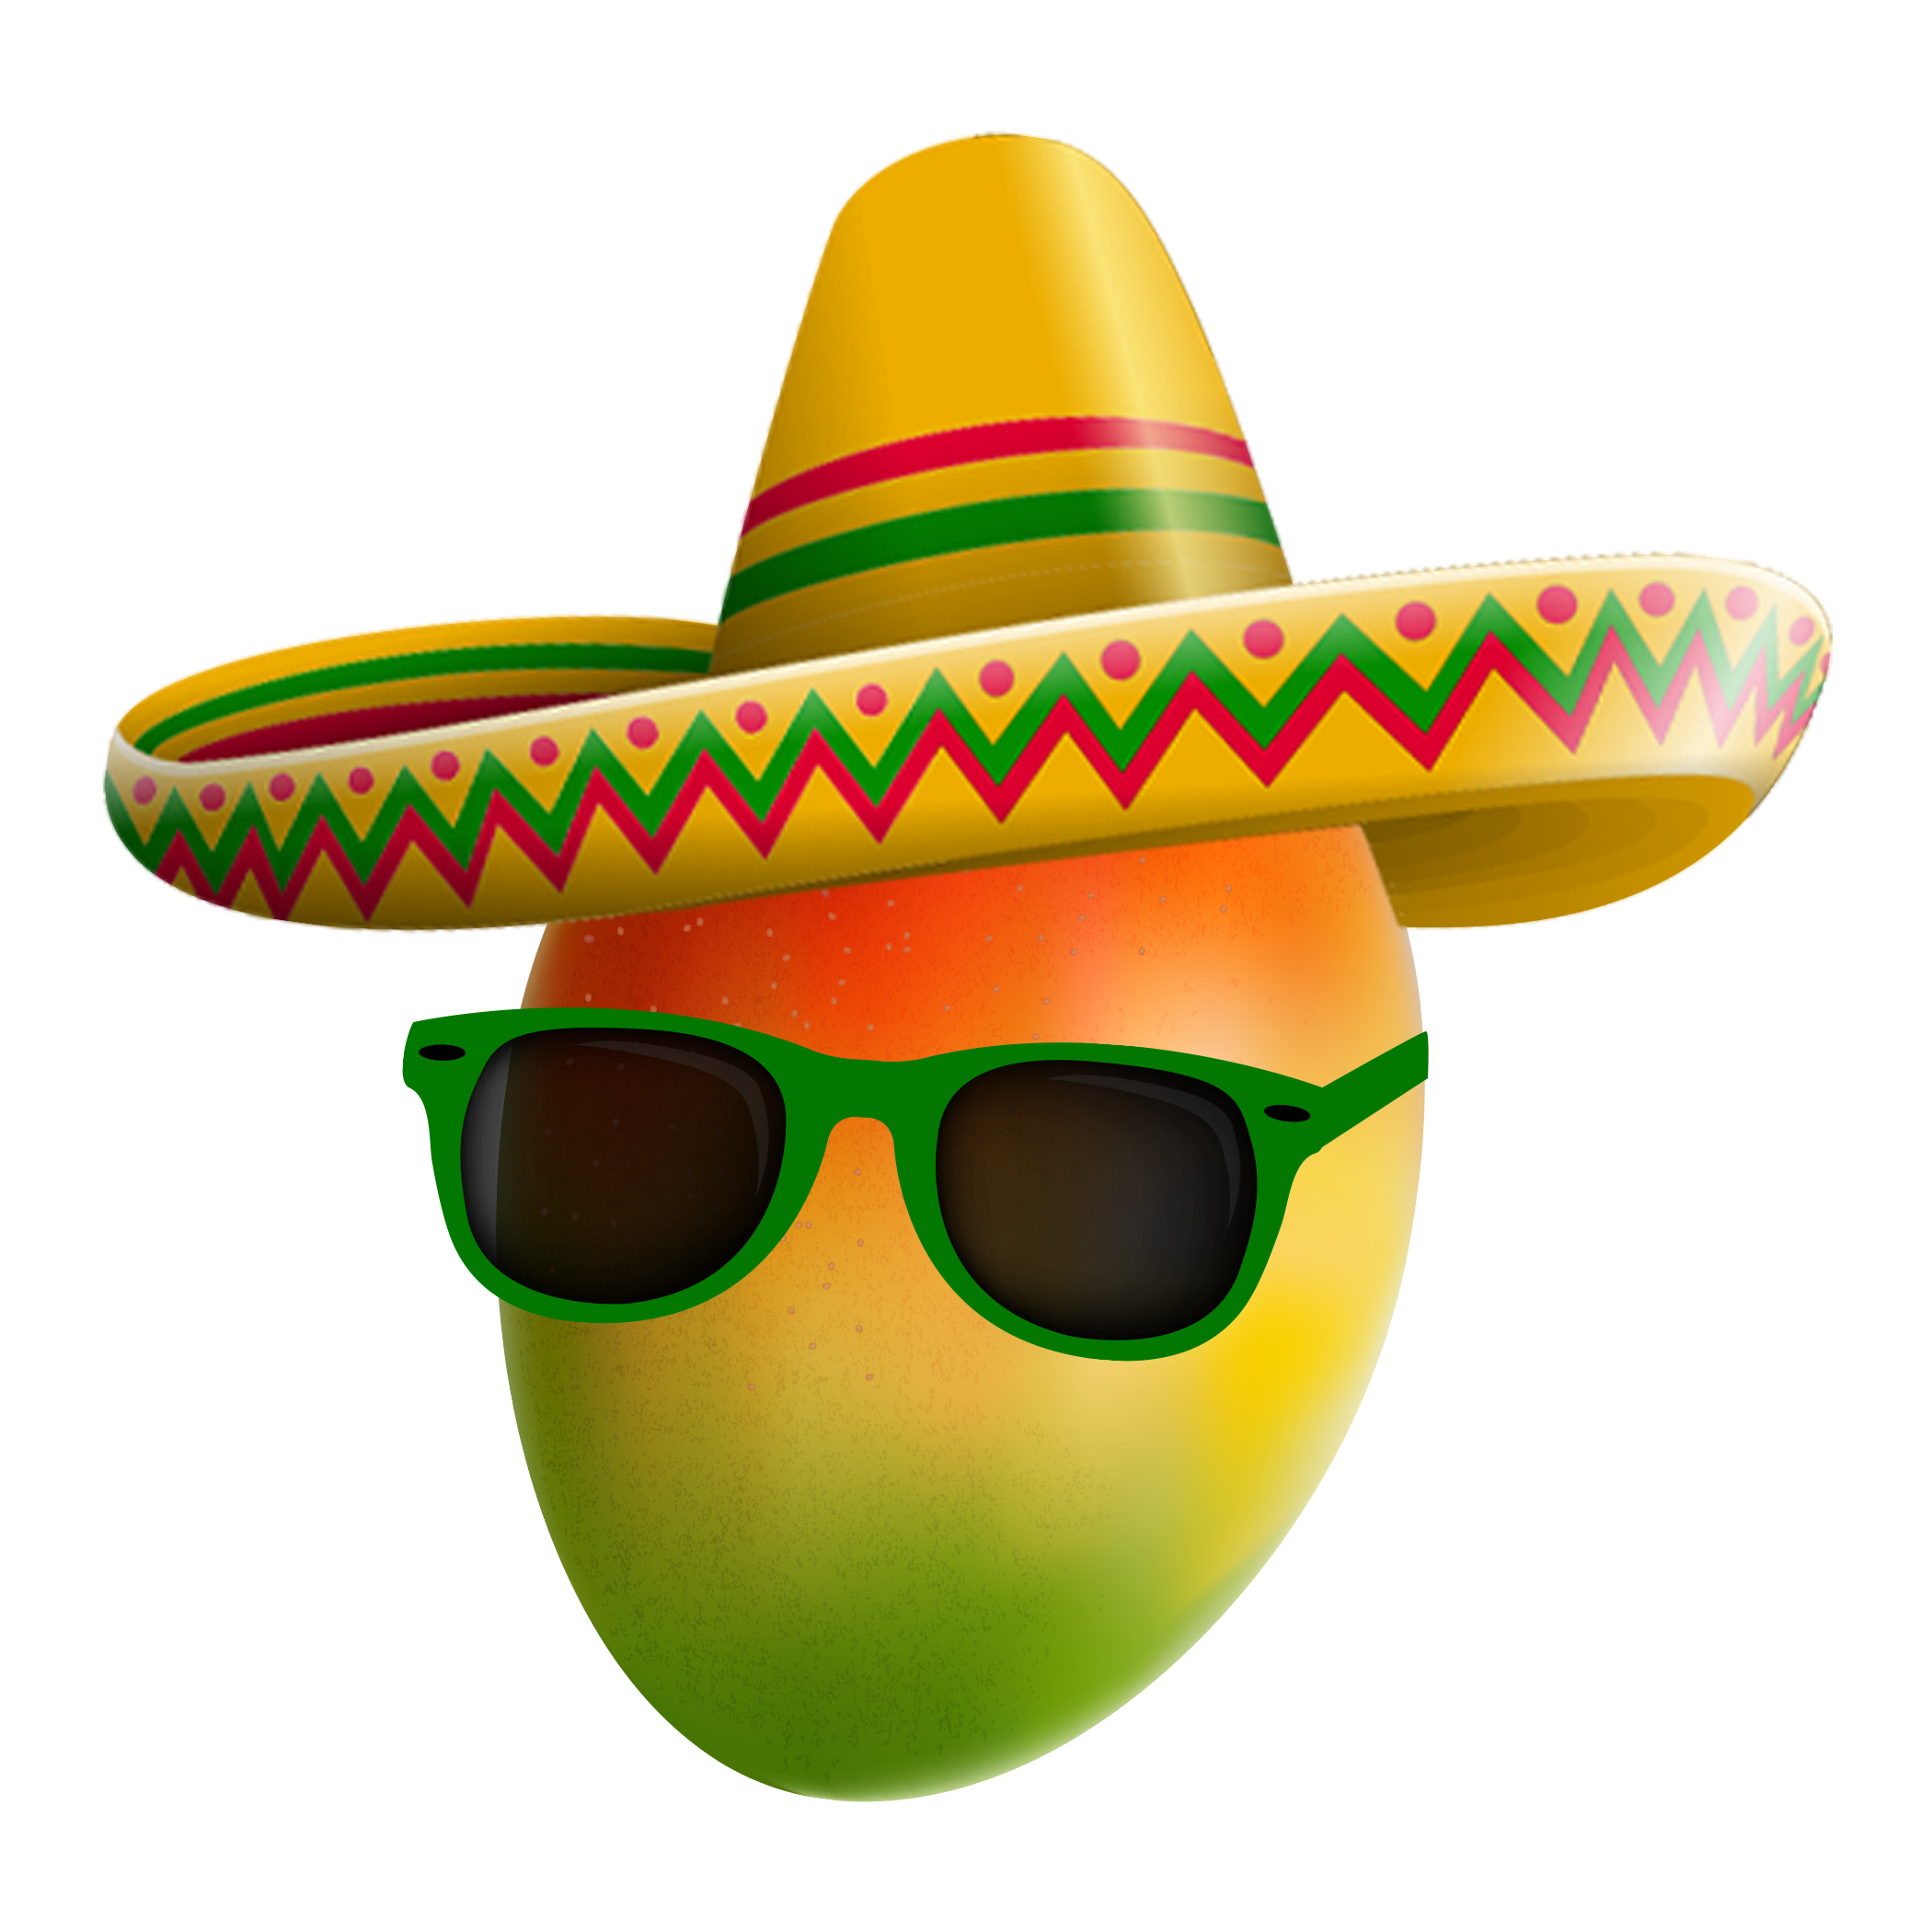 A mango wearing green sunglasses and a sombrero